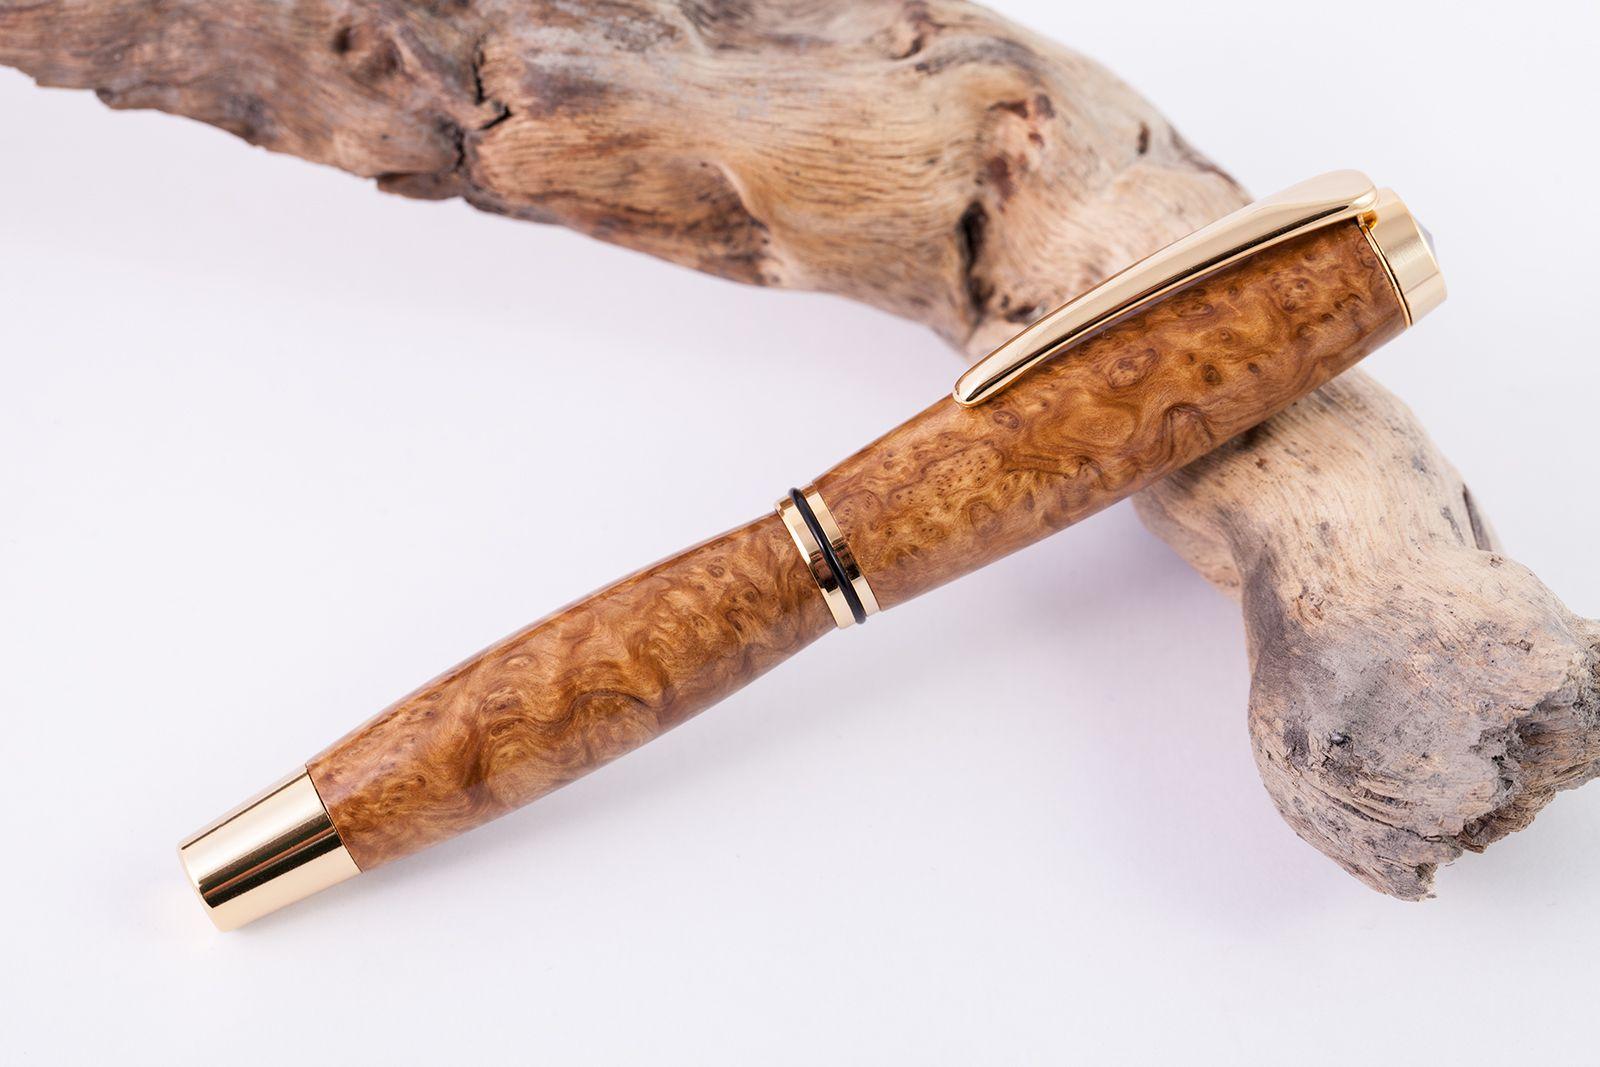 Füllfederhalter aus Brown-Mallee Maserholz Füller geschlossen